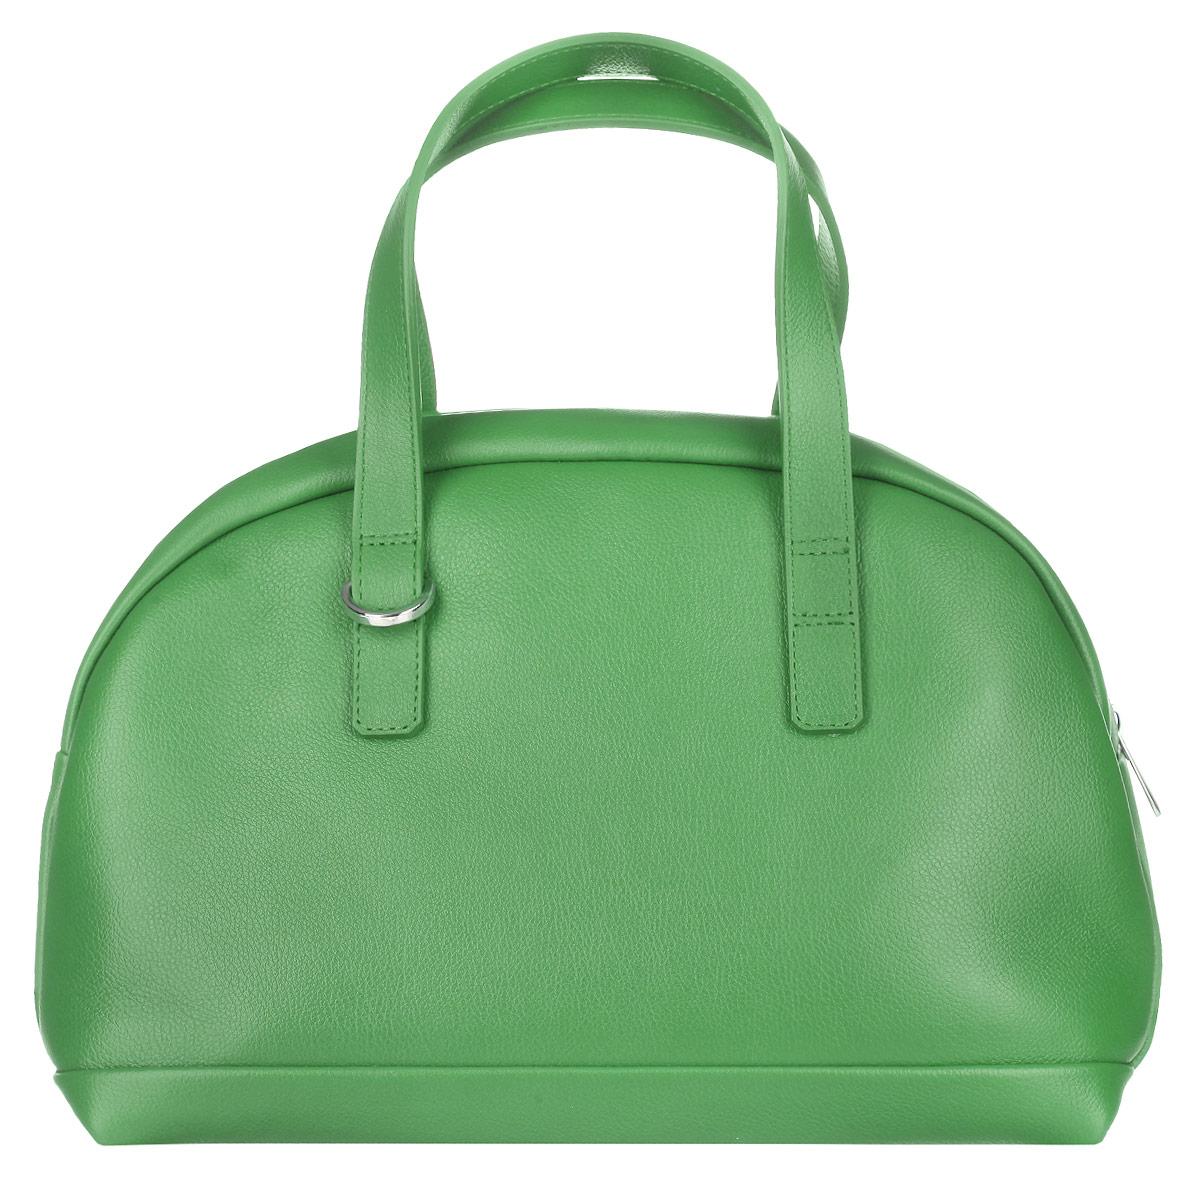 Сумка женская Fabula, цвет: зеленый. S.111.FP клатчи fabula s 124 fp zelenyj